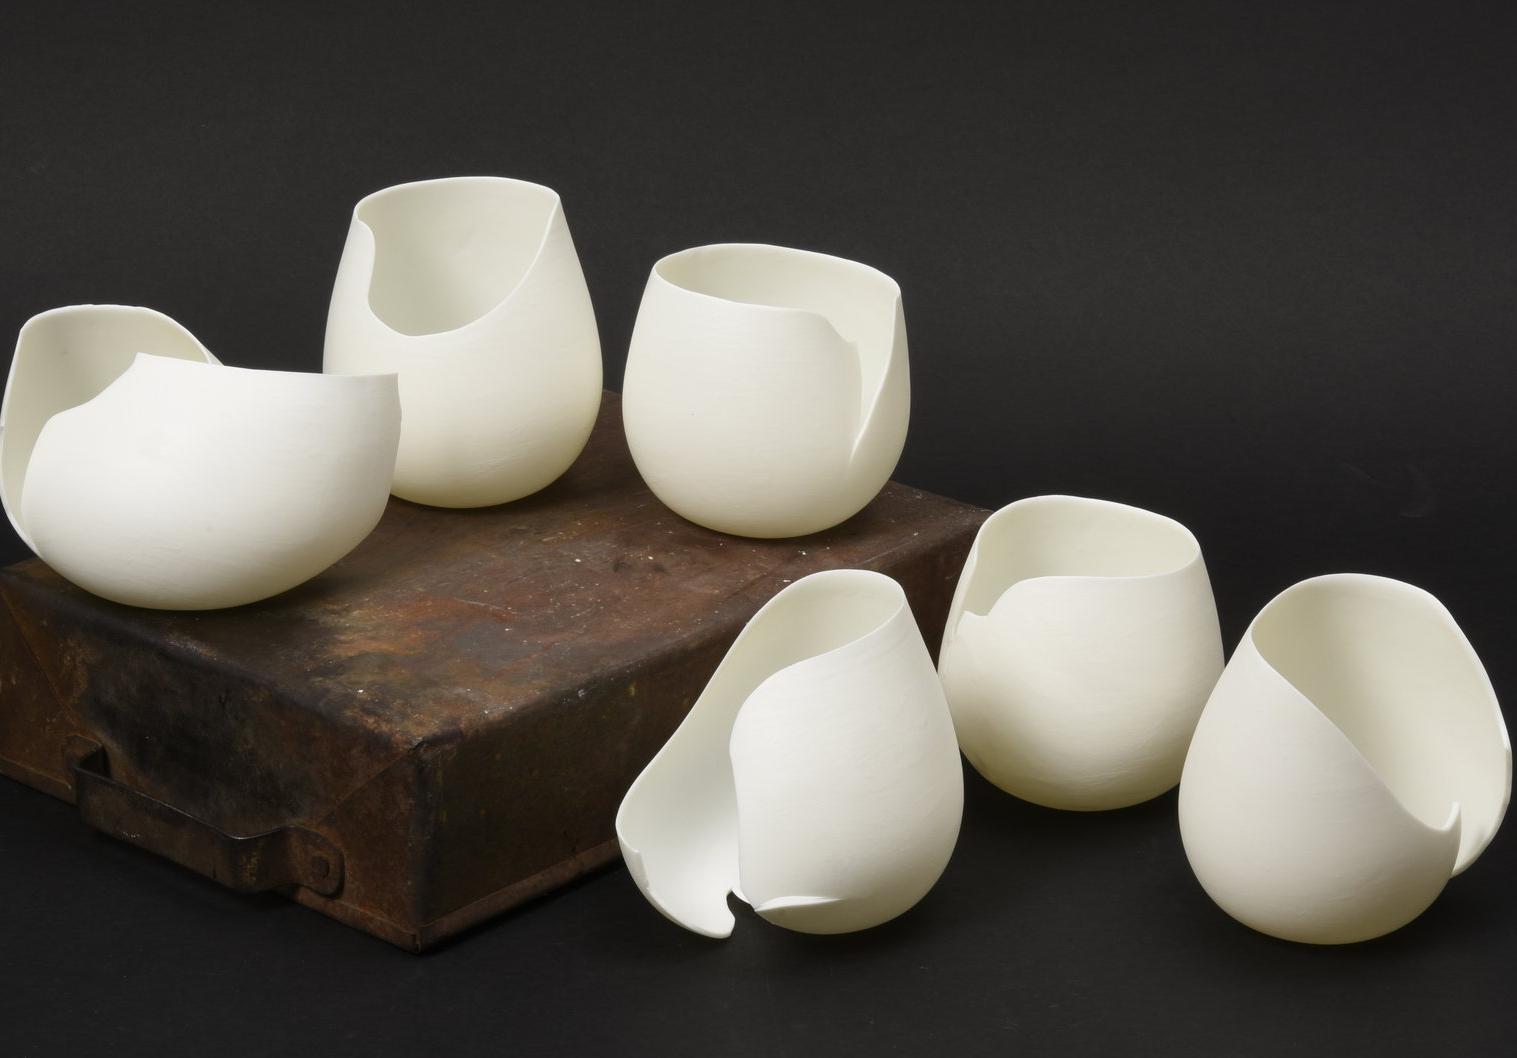 form follows material - porcelain mugs, 2016.